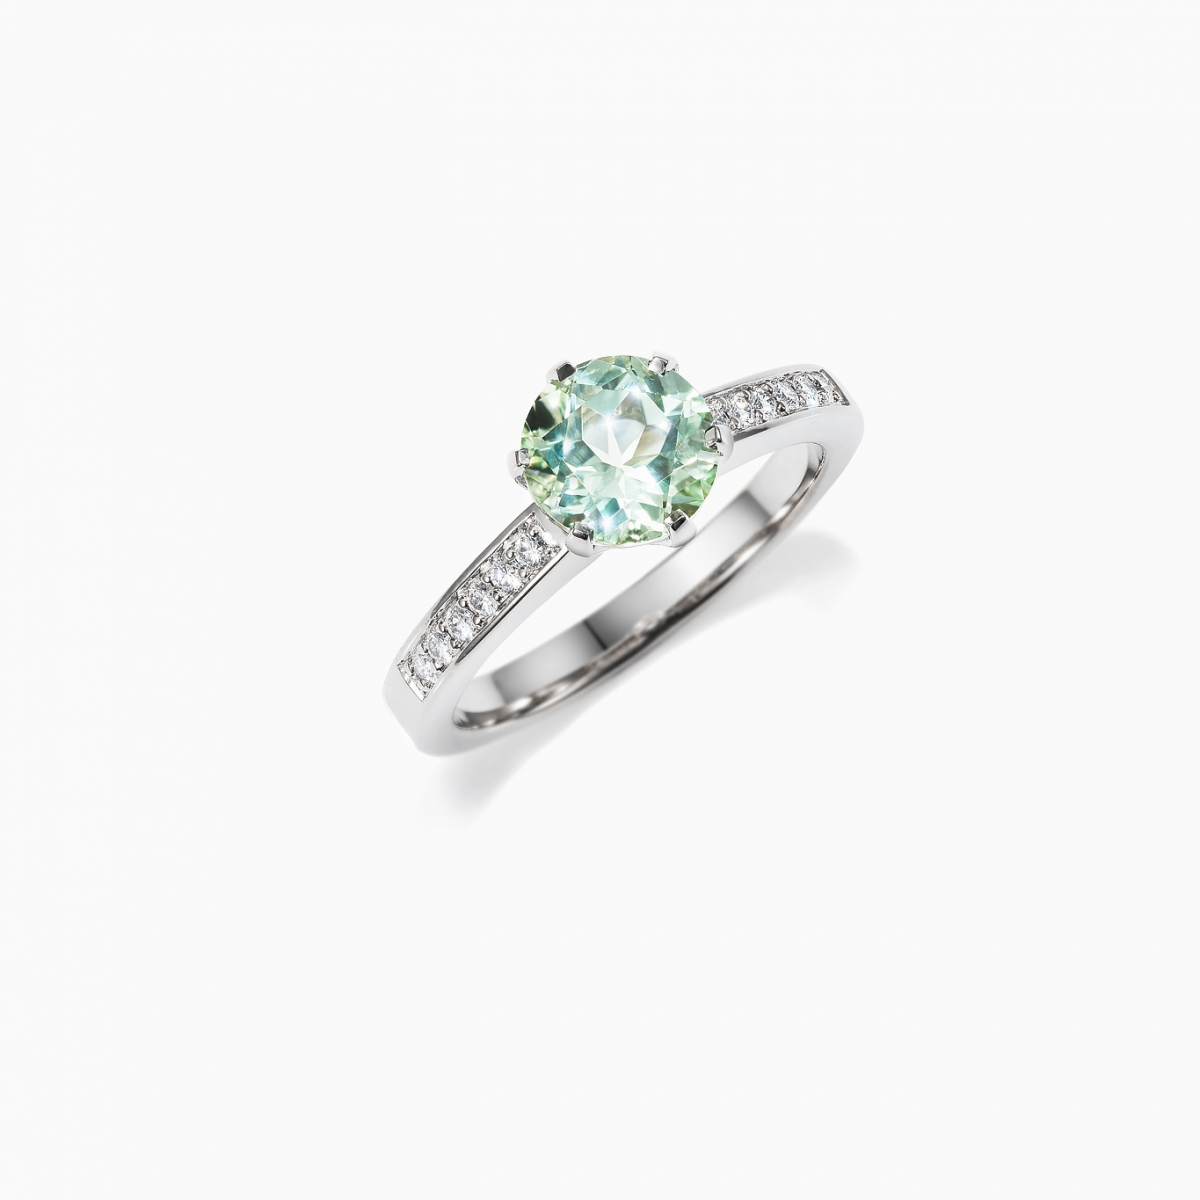 SALE Size 6, Petite Crown Engagement Ring